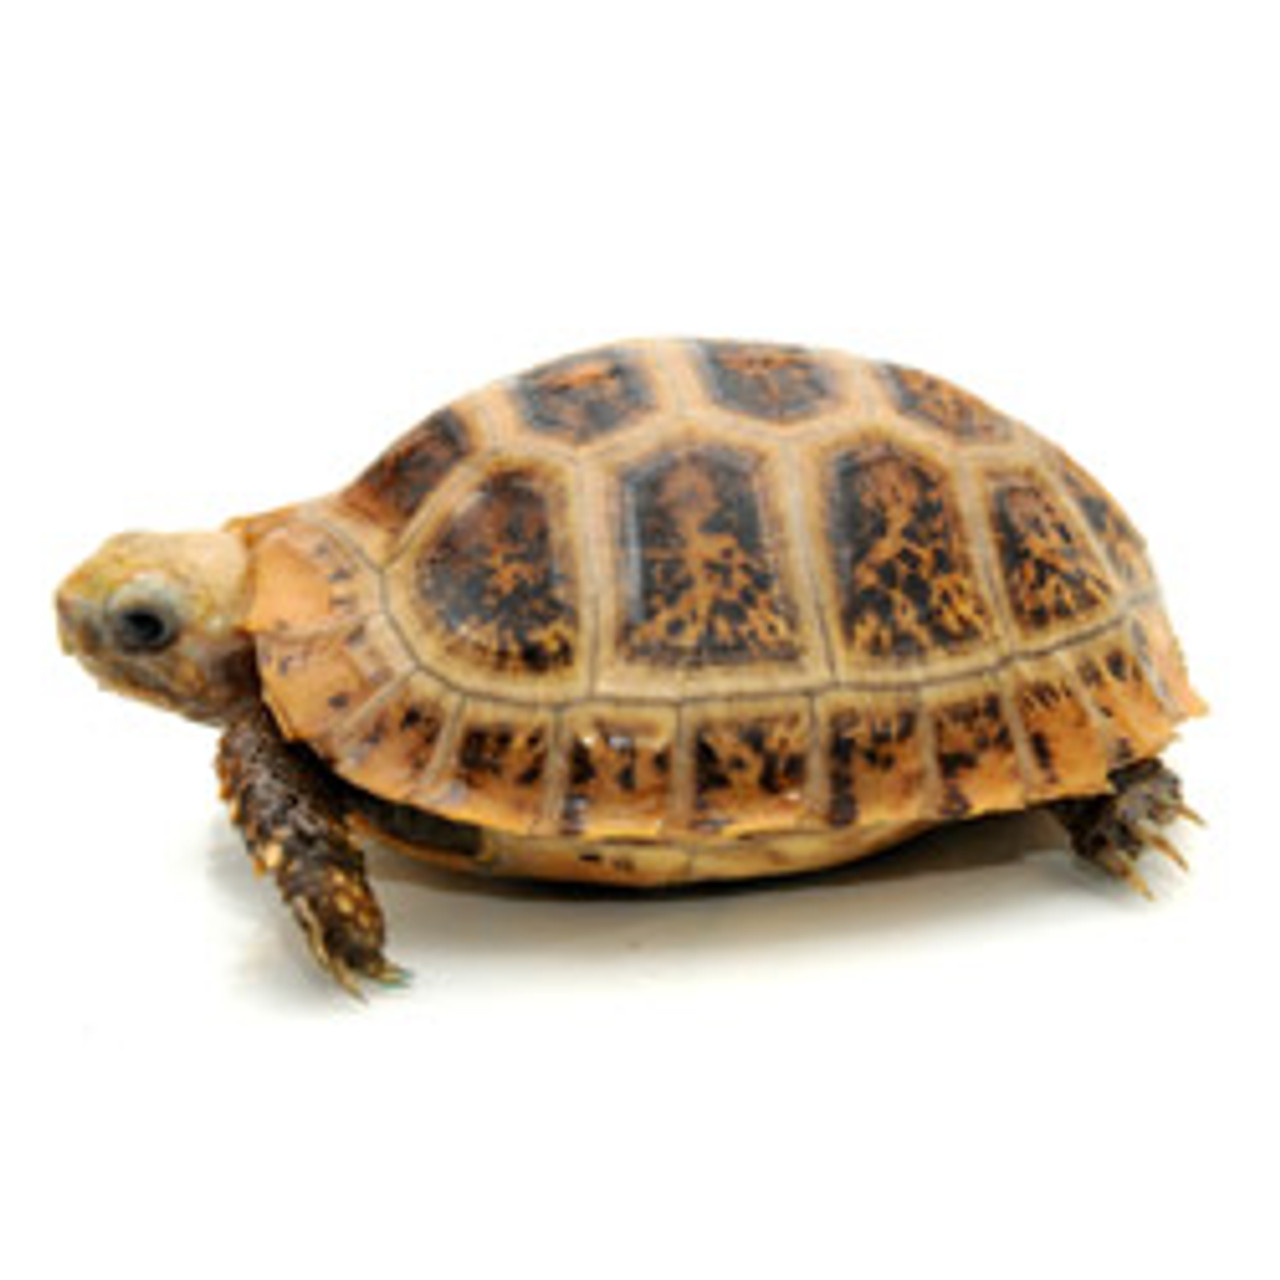 Travancore Hybrid Tortoise (Indotestudo forsteni x travancorica)